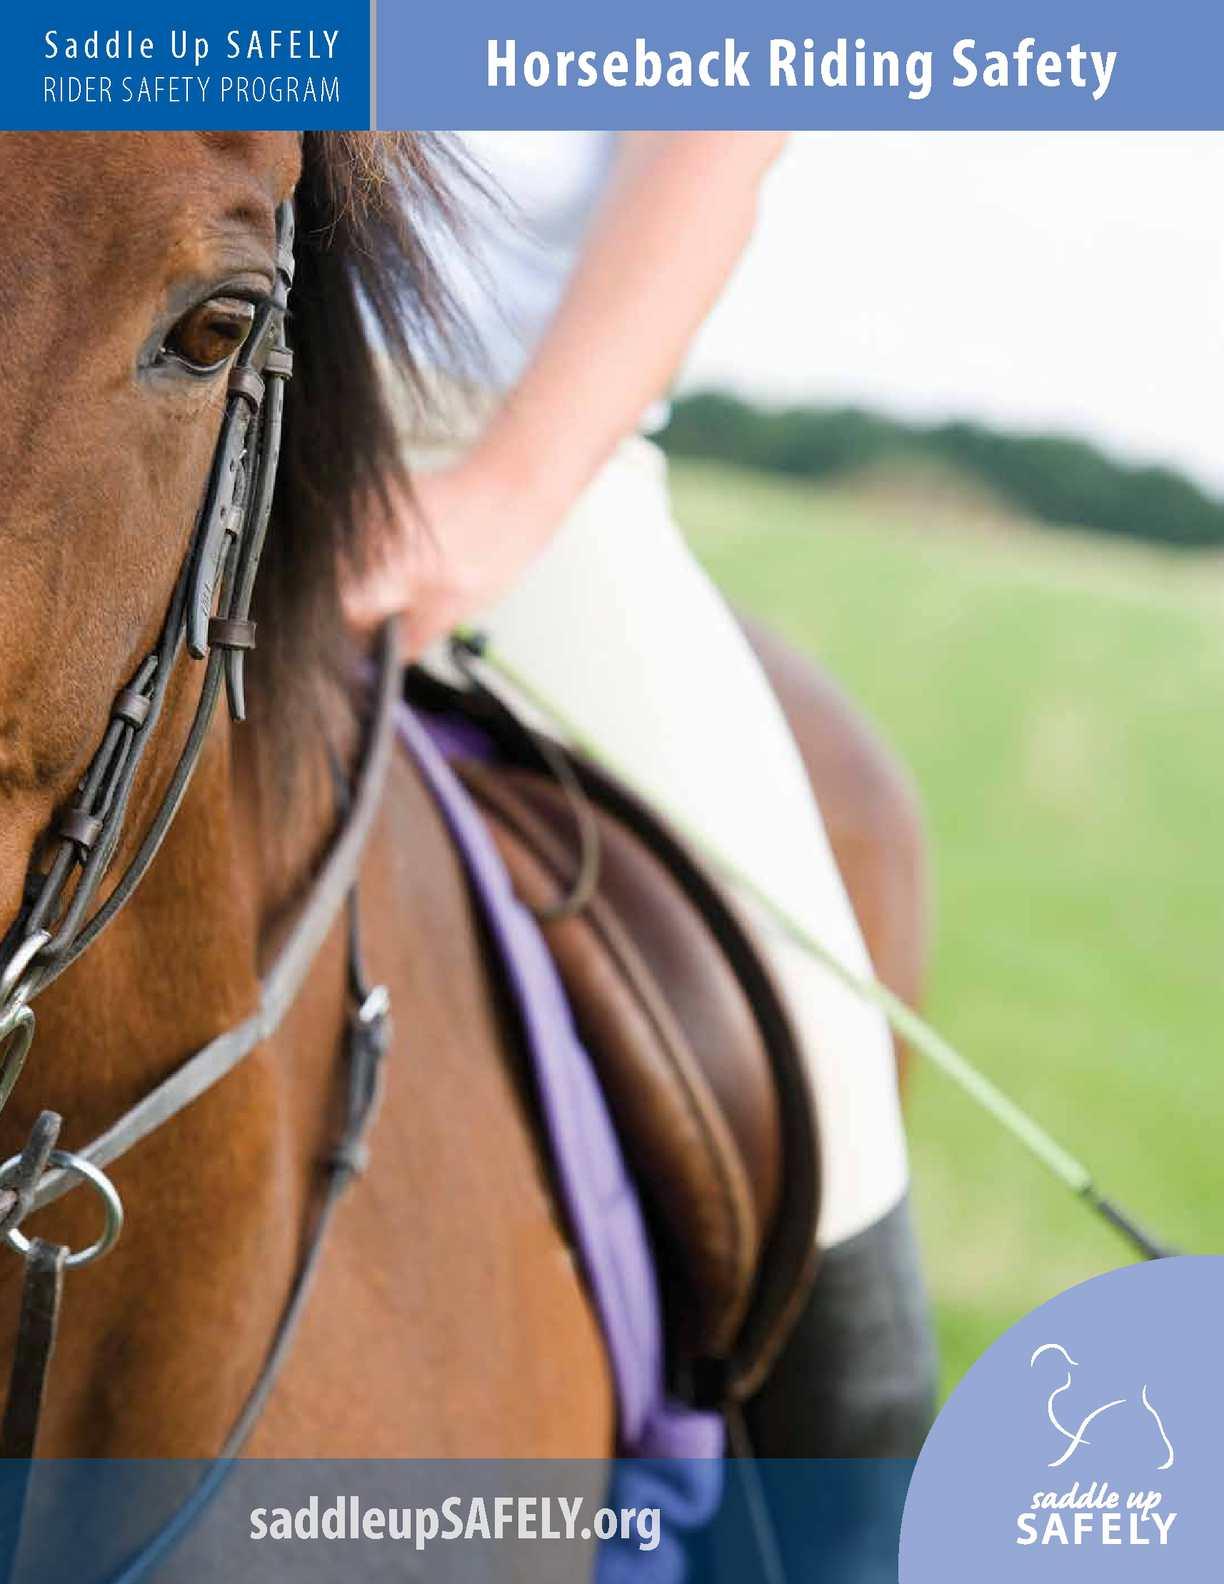 saftey when horseback riding essay